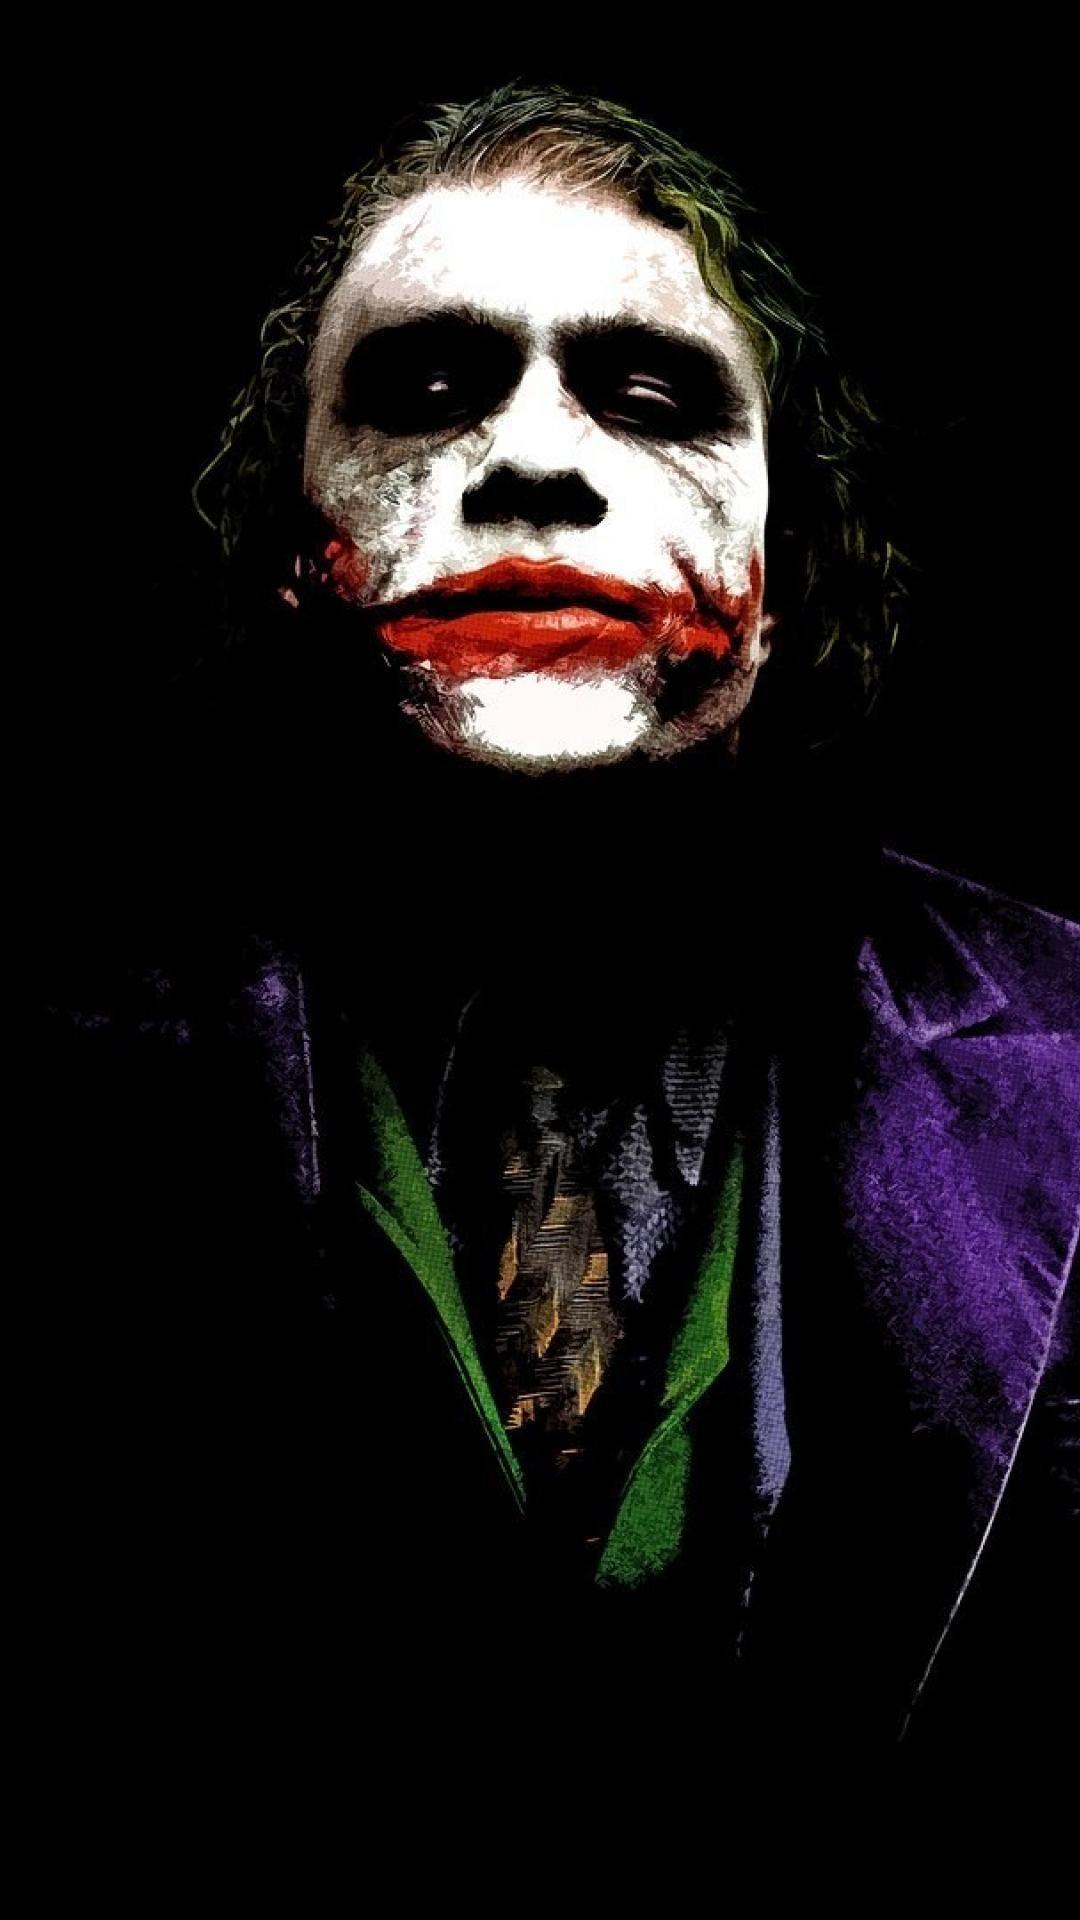 Joker Iphone Wallpapers Top Free Joker Iphone Backgrounds Wallpaperaccess